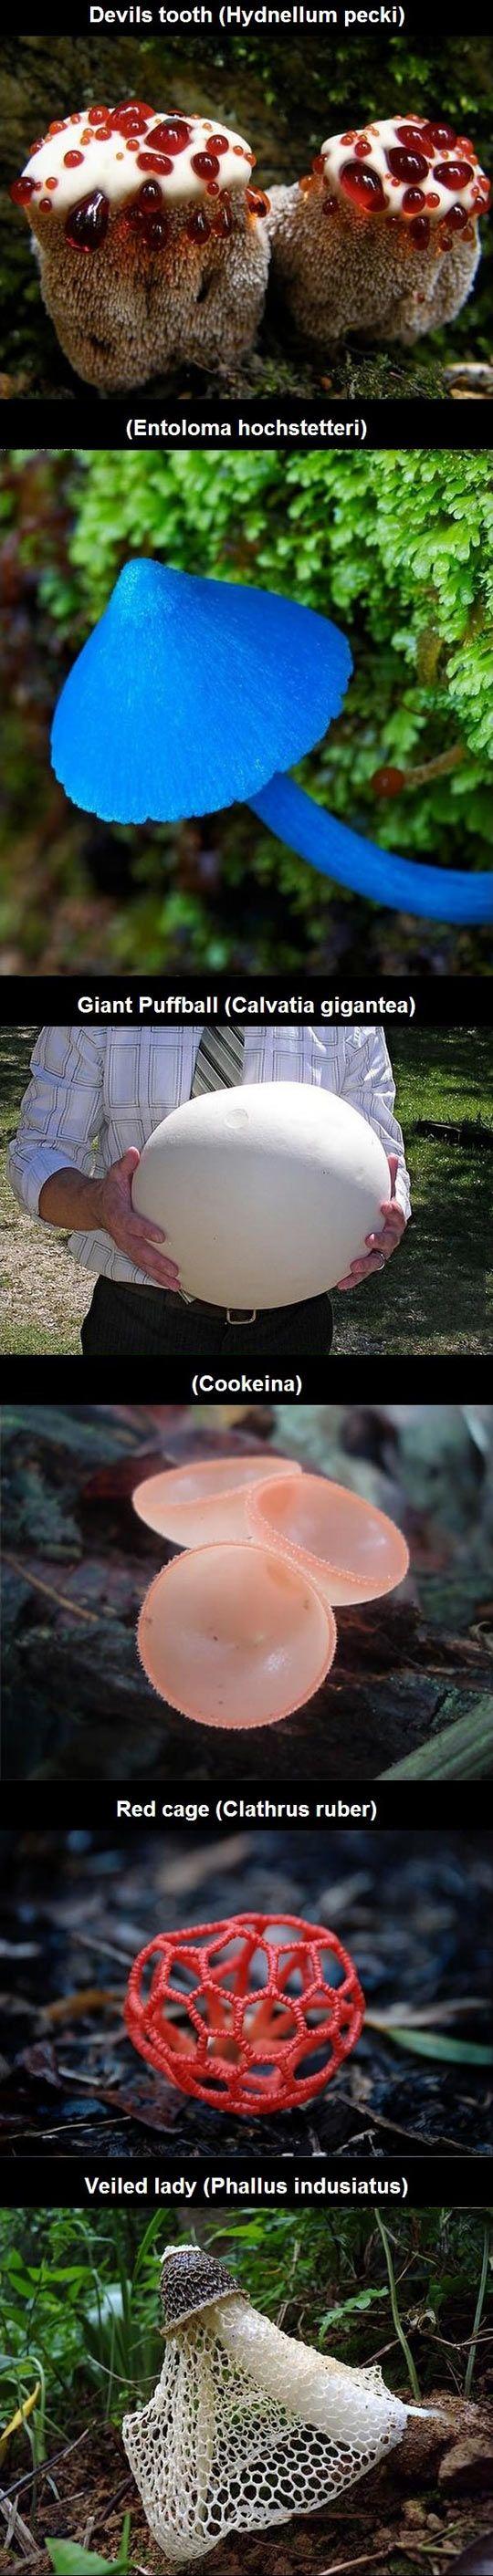 some fungi...